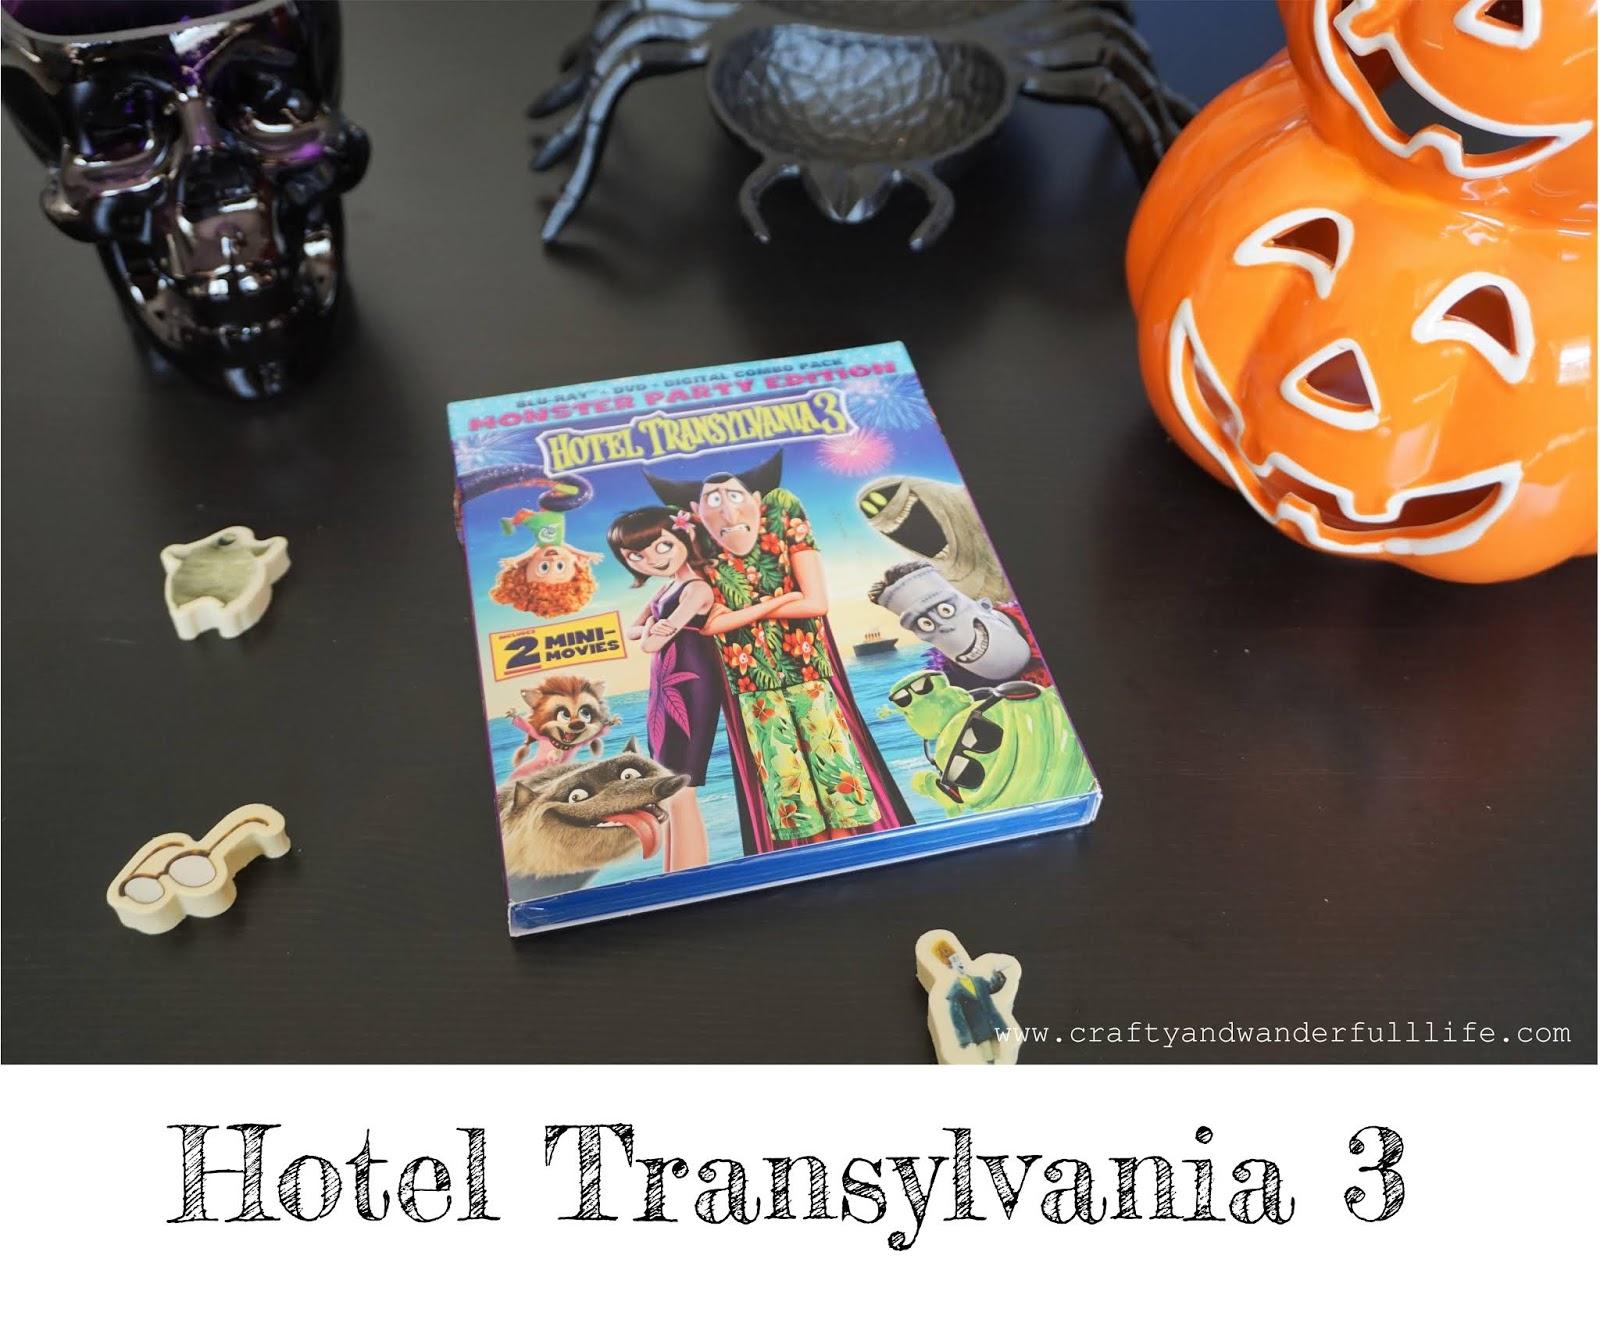 Crafty And Wanderfull Life: Hotel Transylvania 3